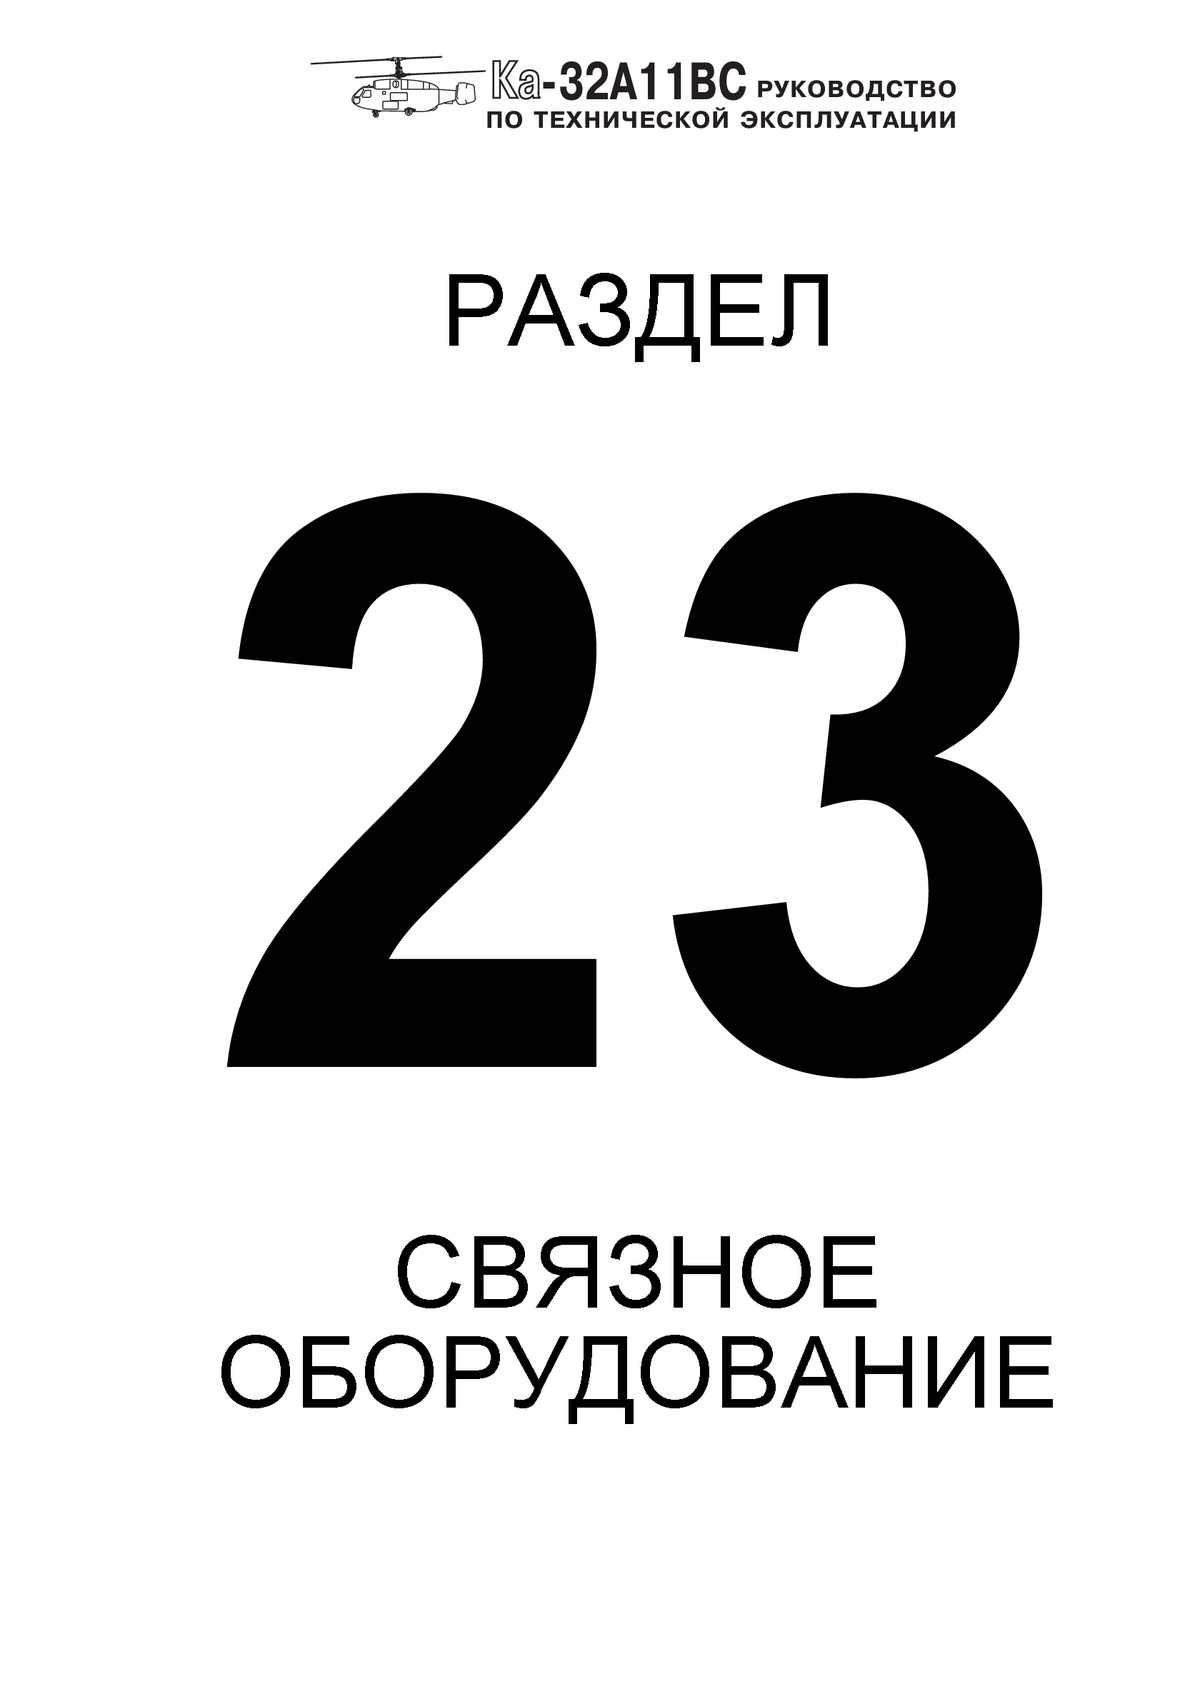 схема переговорного устройства см-204